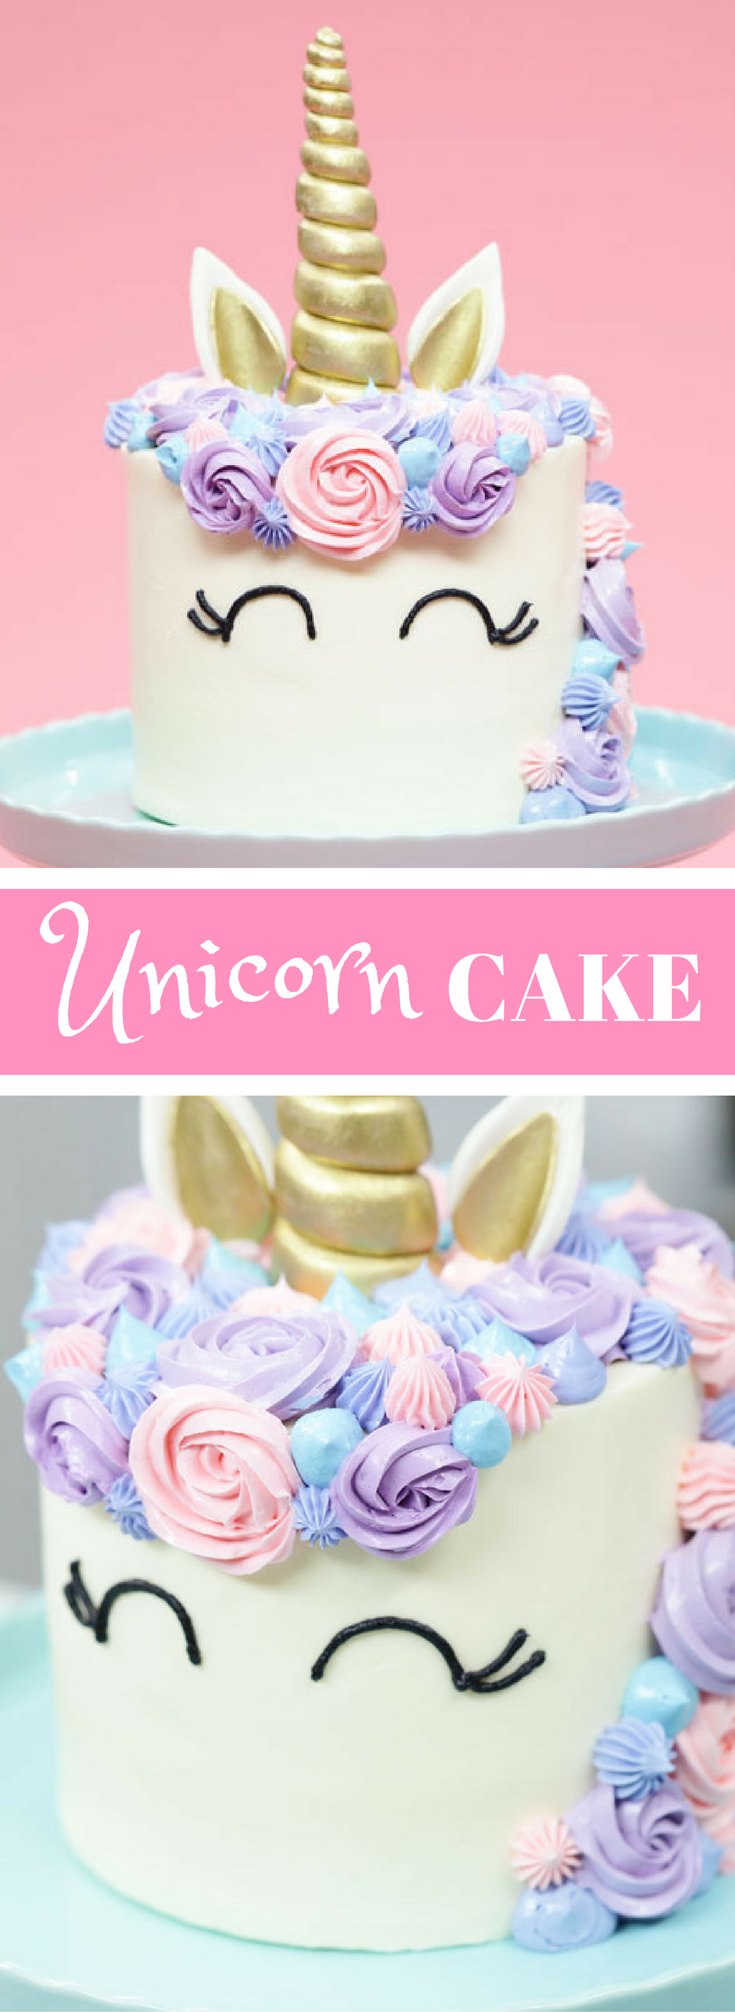 Unicorn Cake Unicorn Birthday Cake Unicorn Cake Unicorn Foods